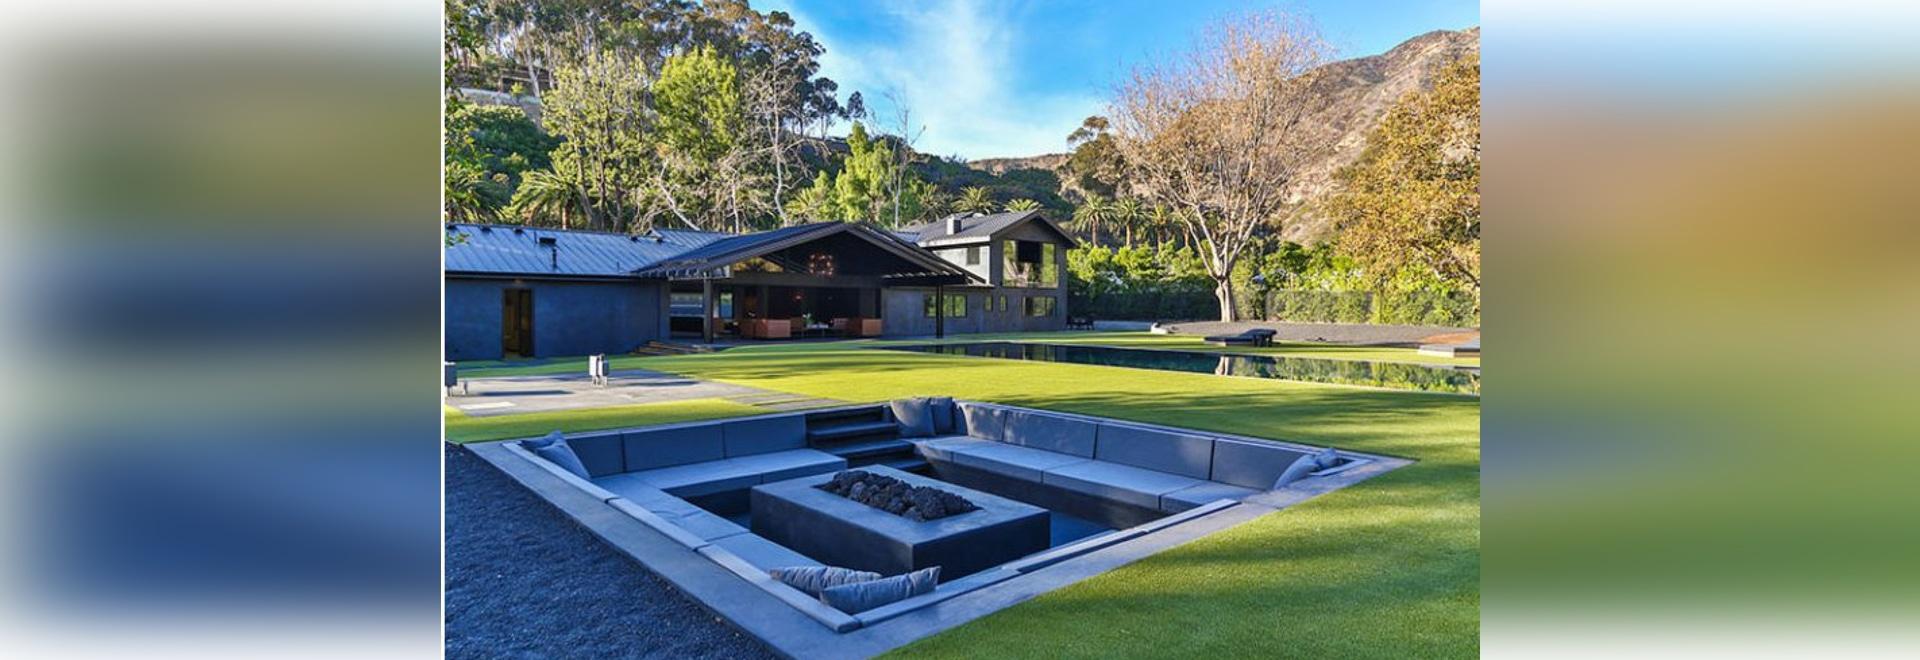 backyard design idea u2013 create a sunken fire pit for entertaining